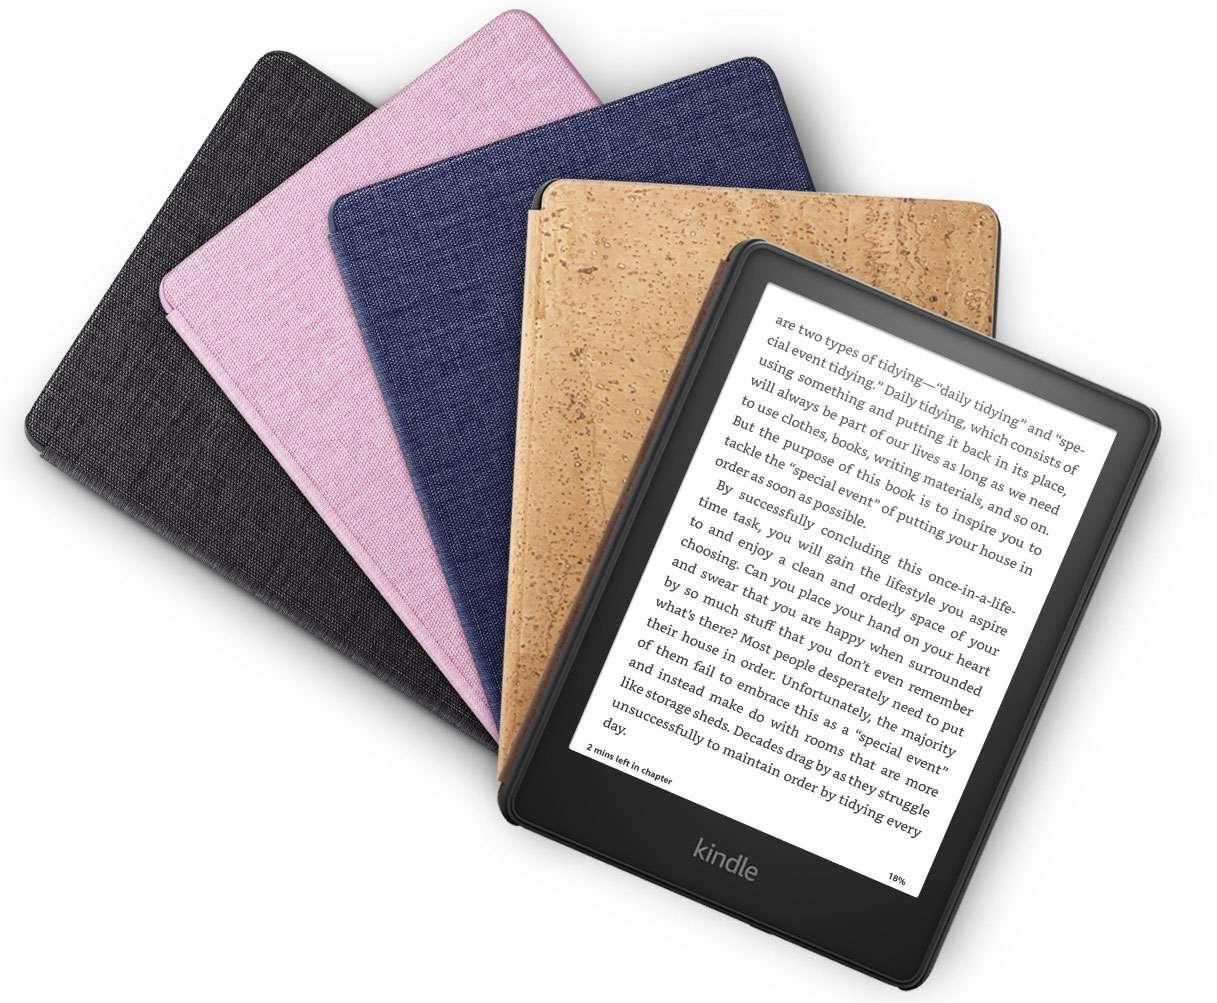 Kindle Paperwhite assortment